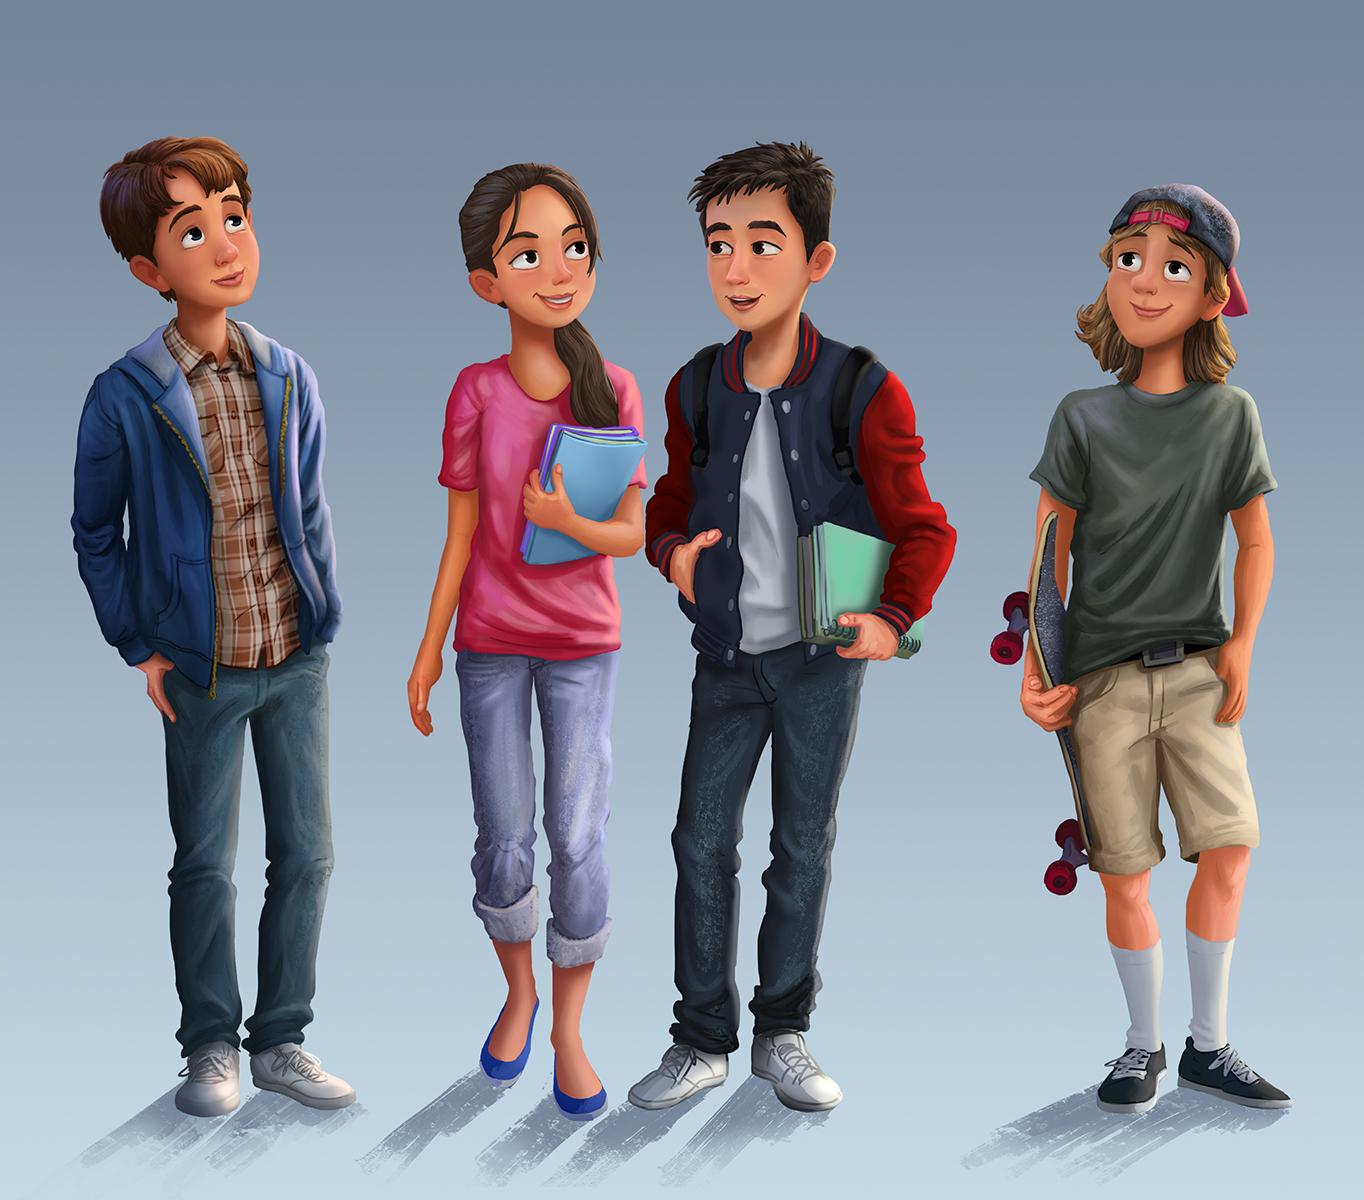 Children S Teens: Erwin Madrid Blog: Illustrations Of Teens